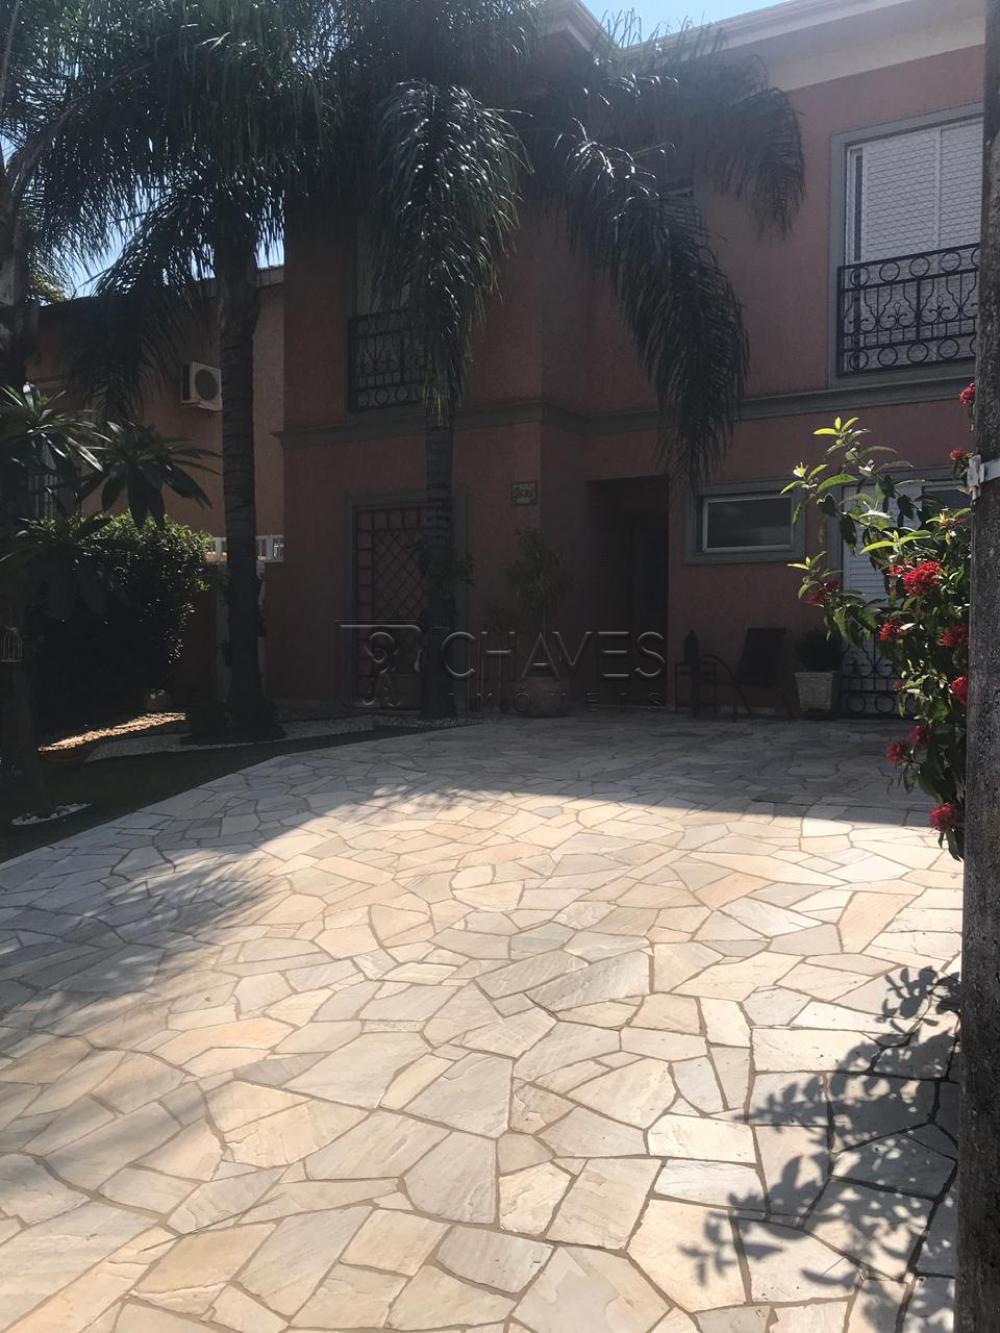 Ribeirao Preto Casa Venda R$850.000,00 Condominio R$300,00 3 Dormitorios 3 Suites Area do terreno 250.00m2 Area construida 210.00m2